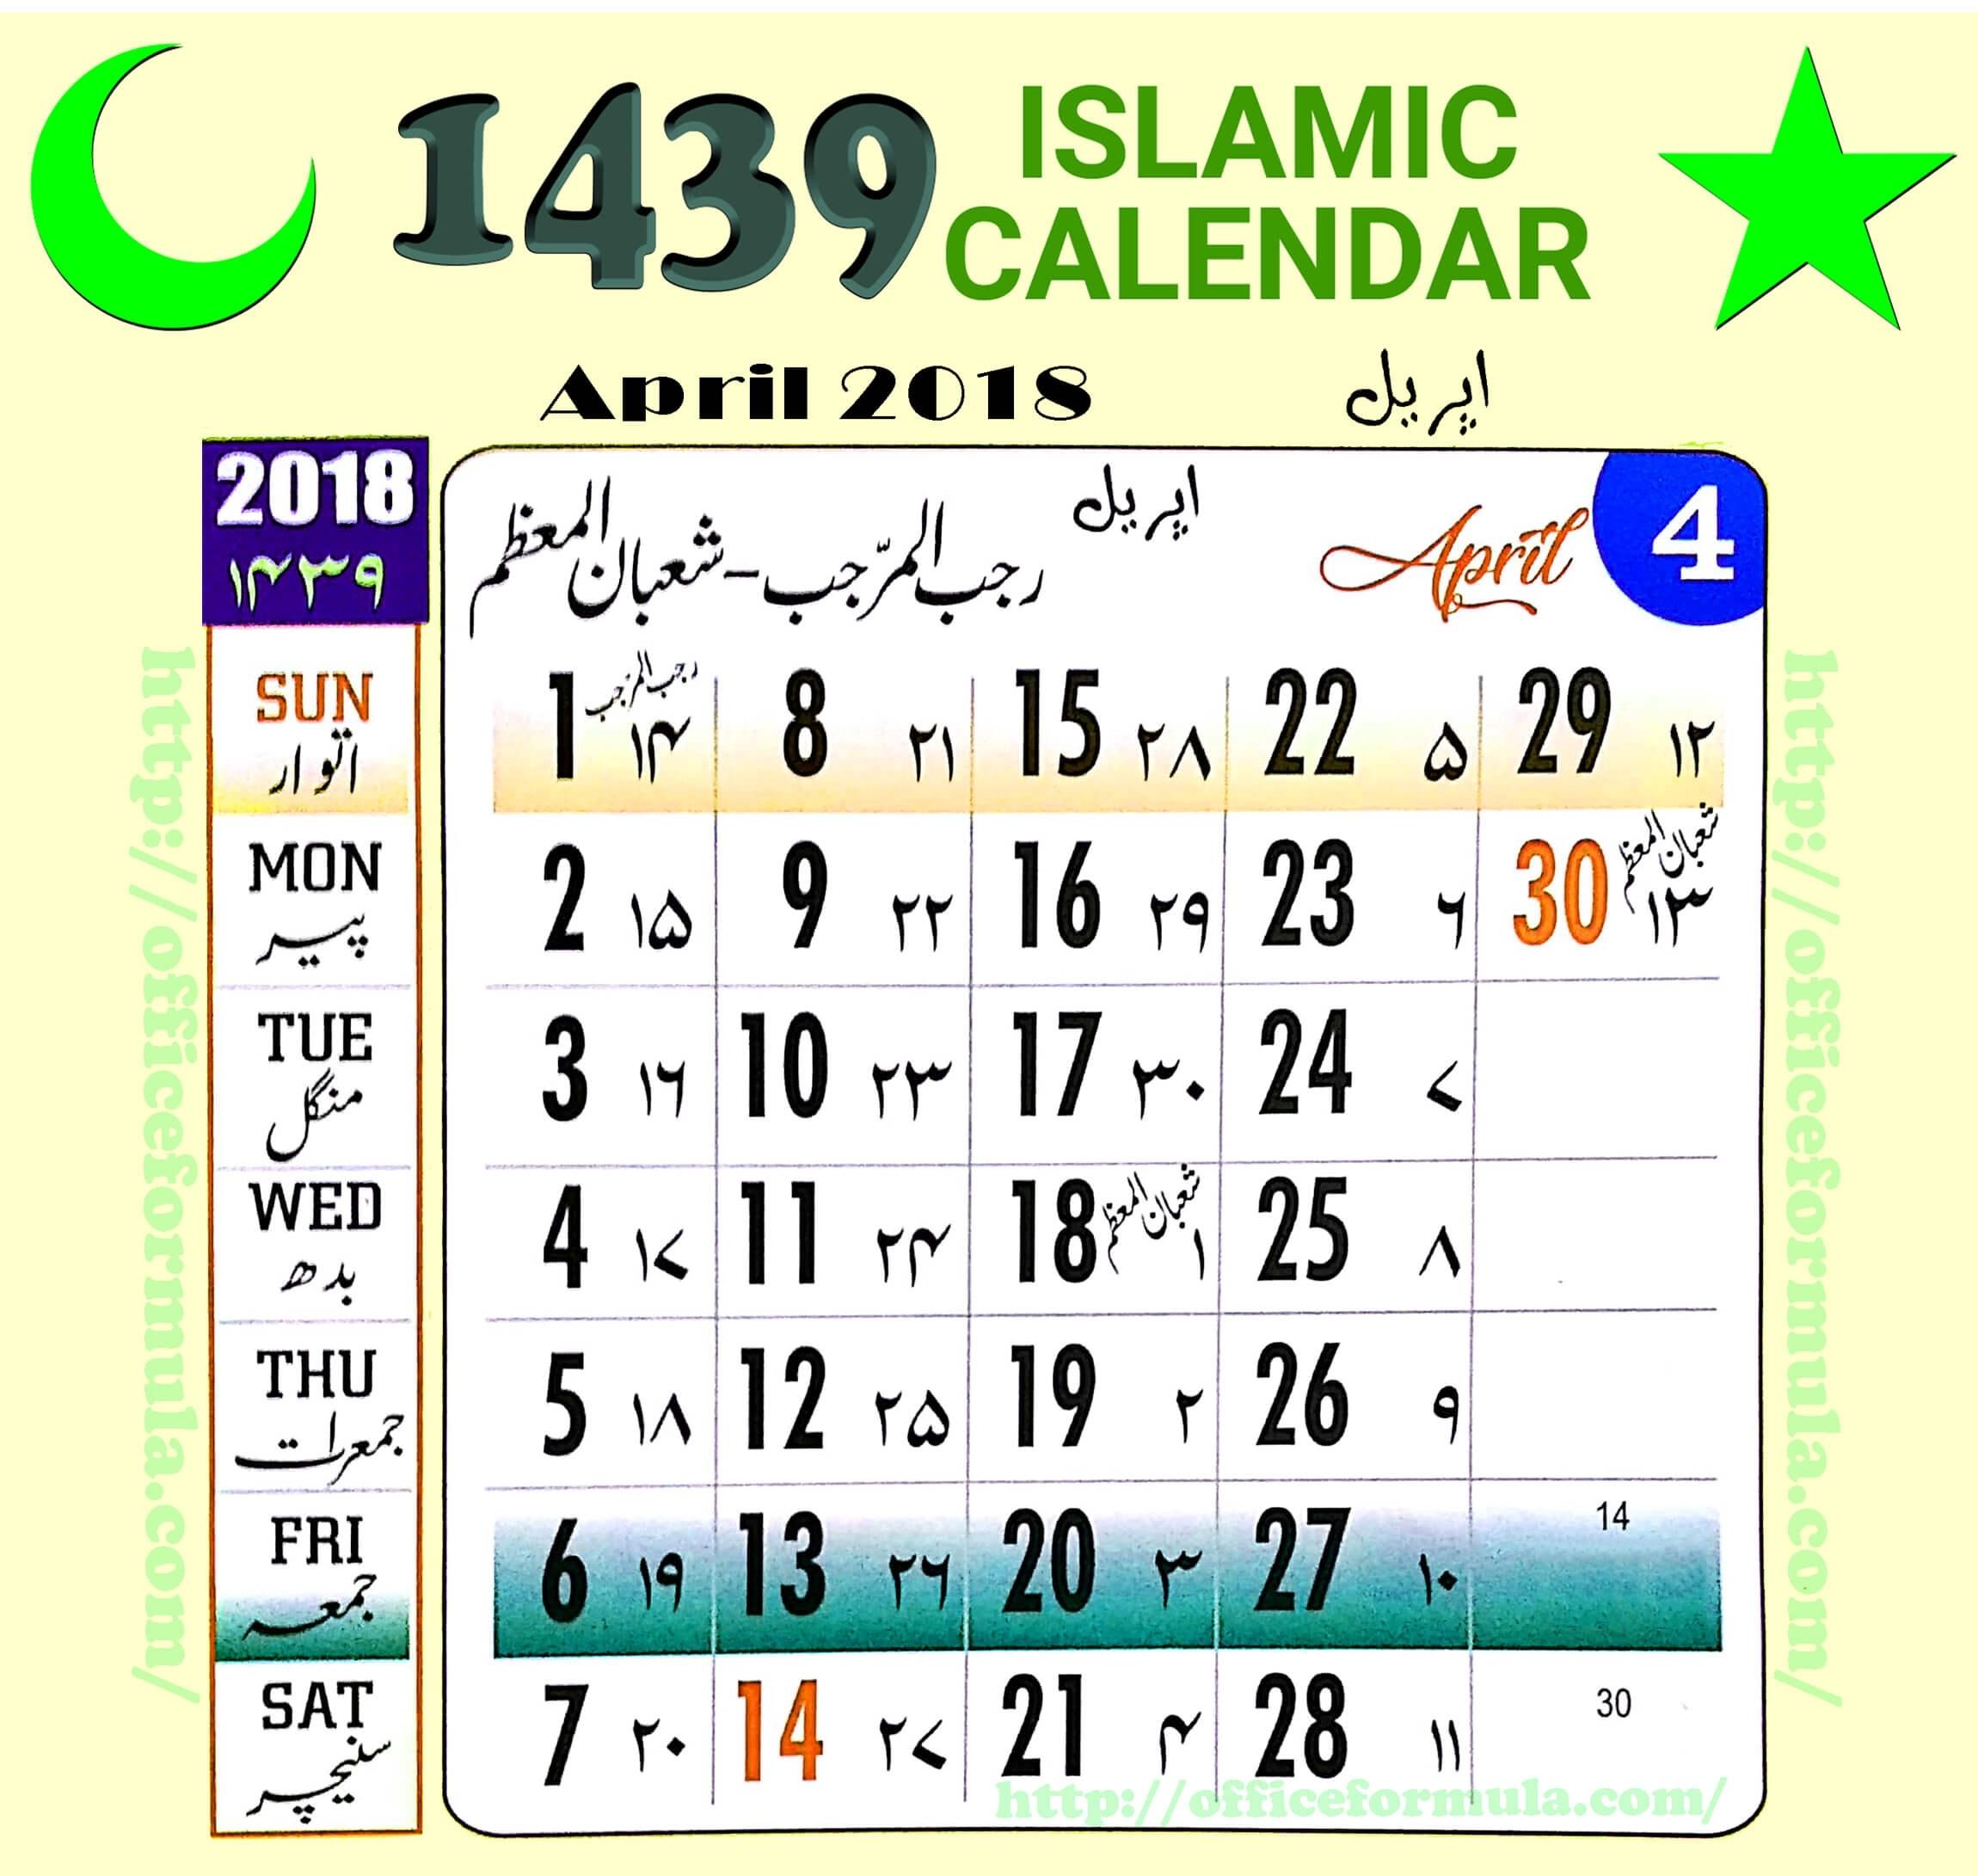 April 2018 Islamic Calendar | April Hijri Calendar 1439 within Islamic Calander Template Lunar Cycle